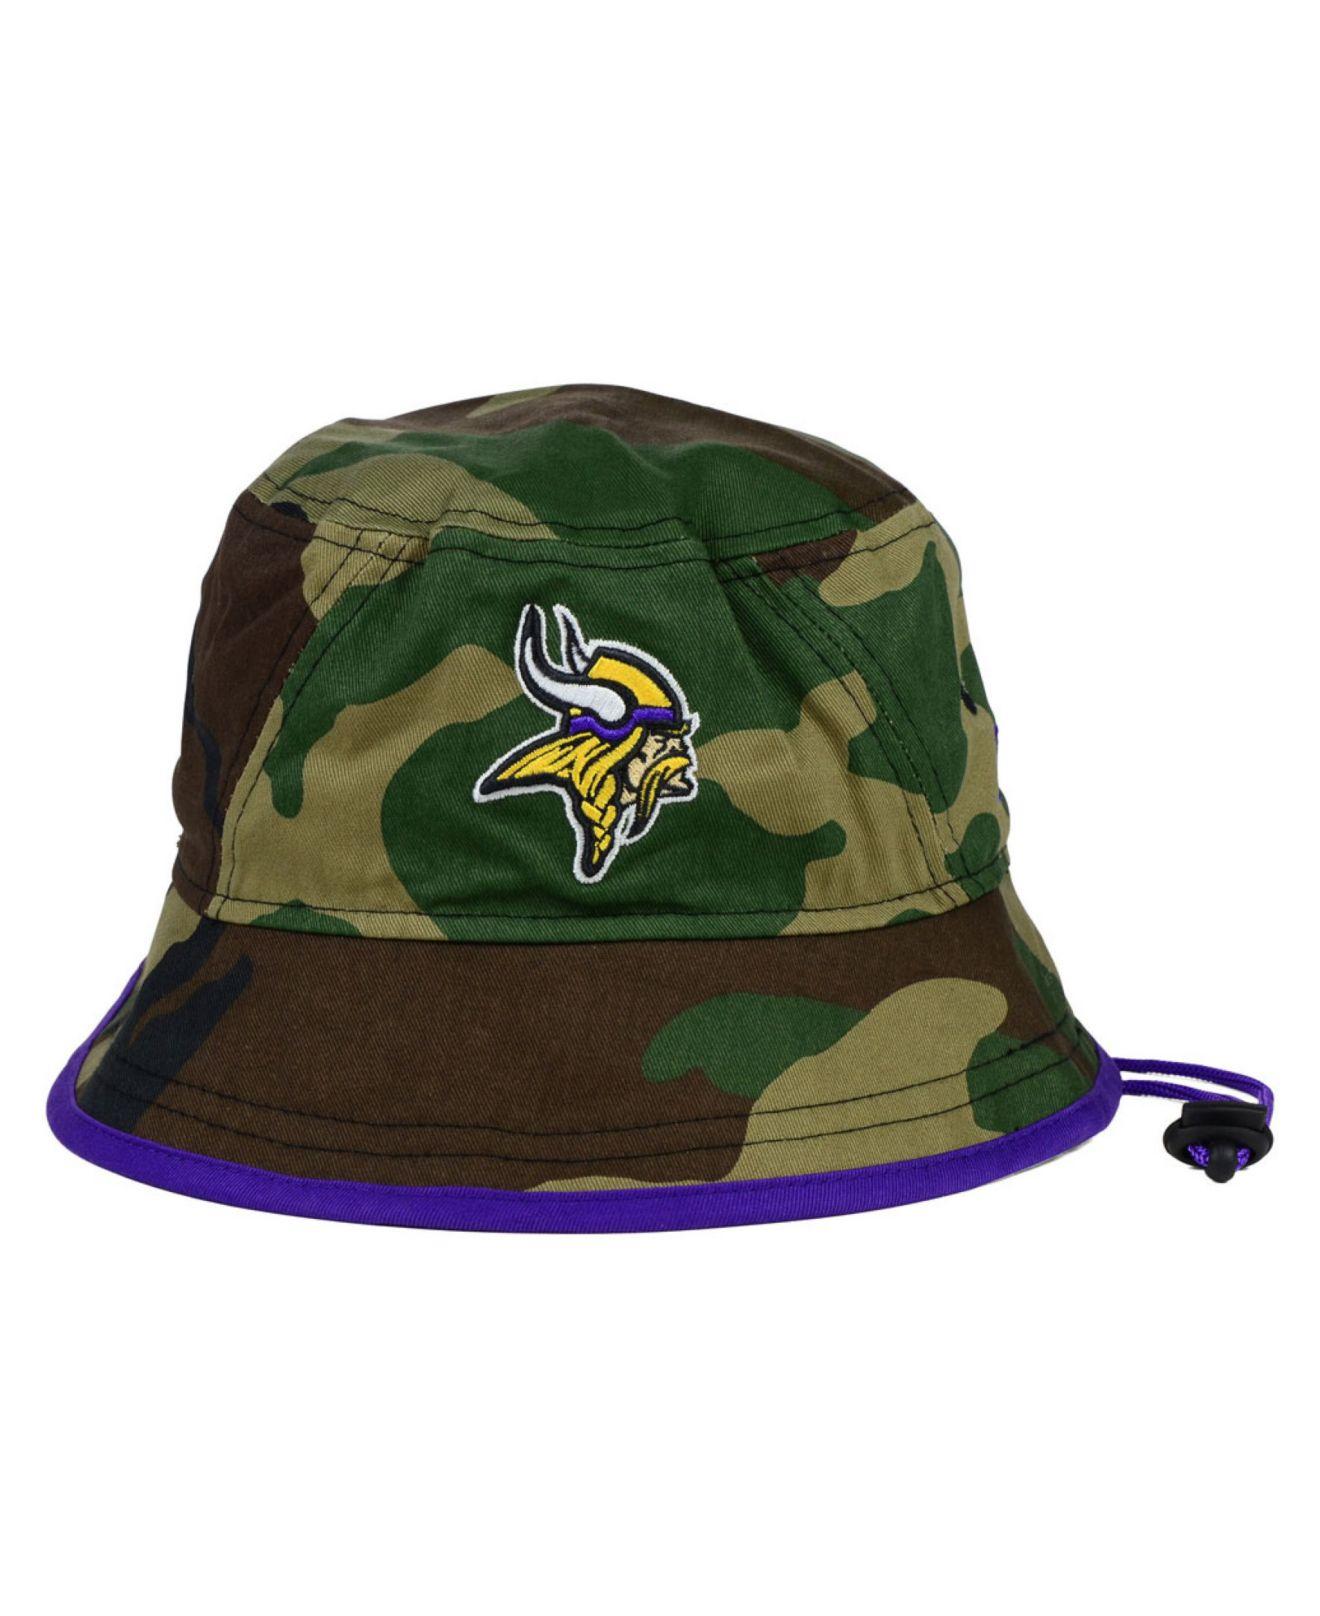 395d2faec Lyst - KTZ Minnesota Vikings Camo Pop Bucket Hat in Green for Men